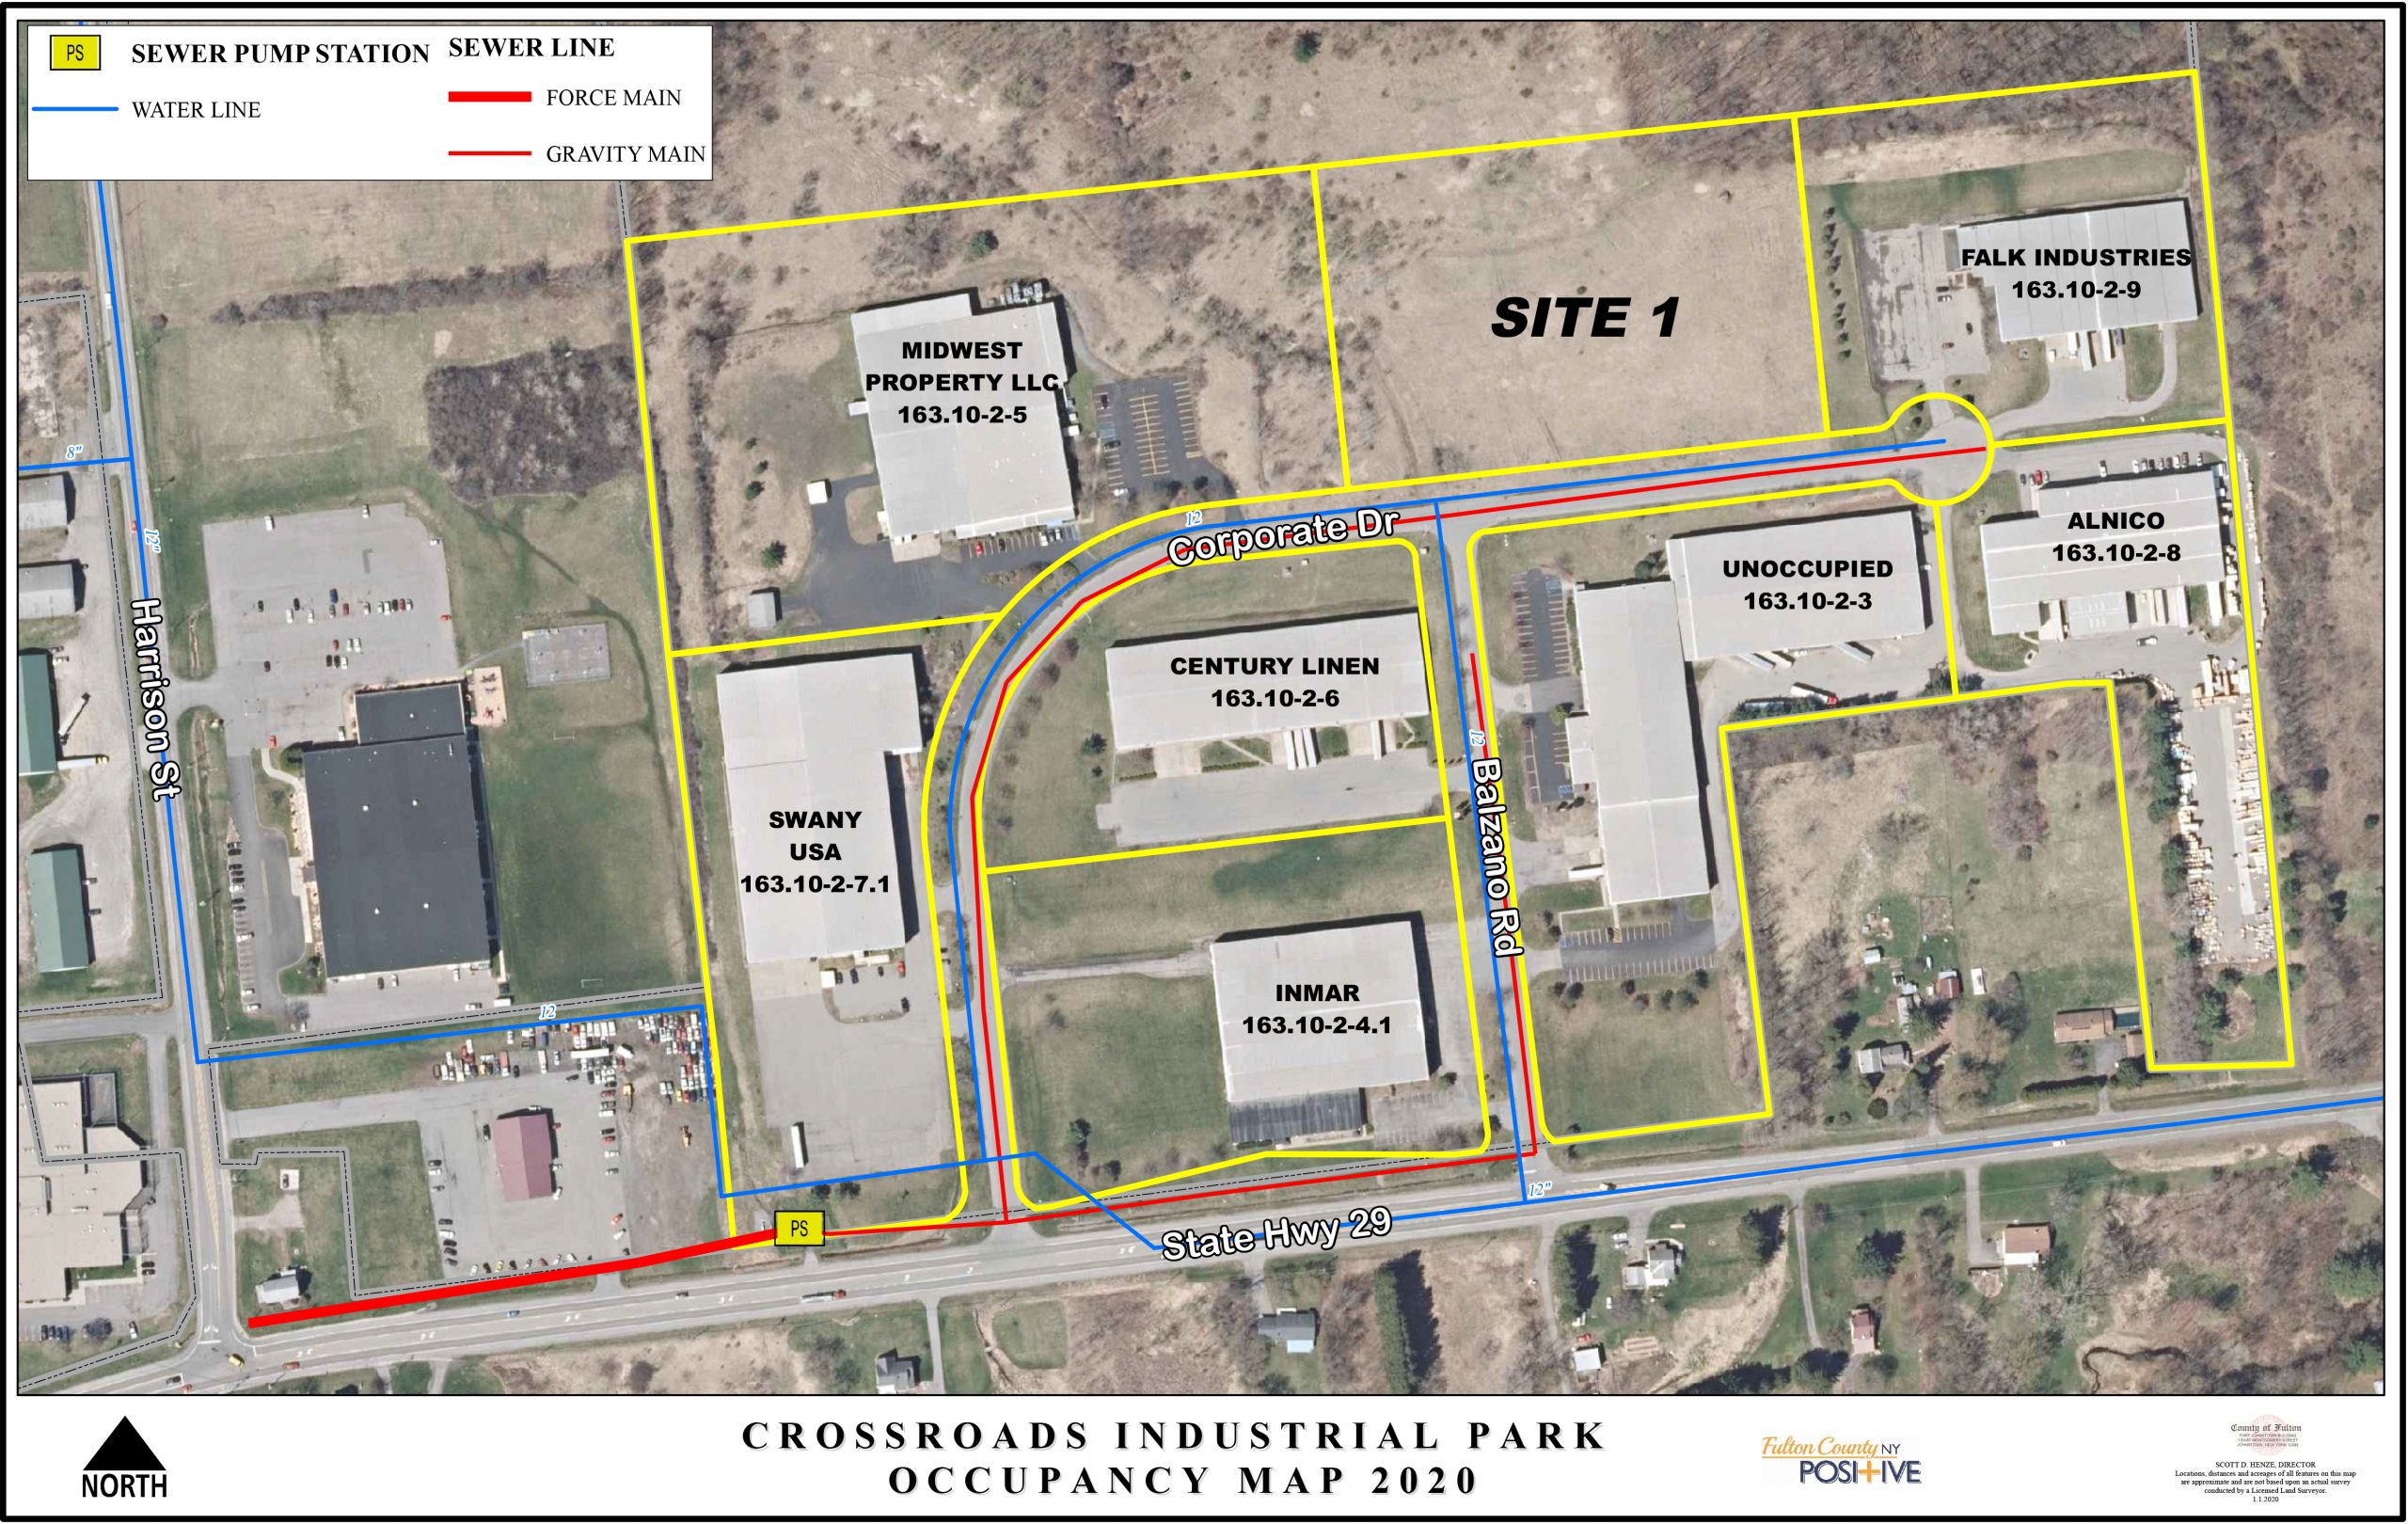 Crossroads Industrial Park